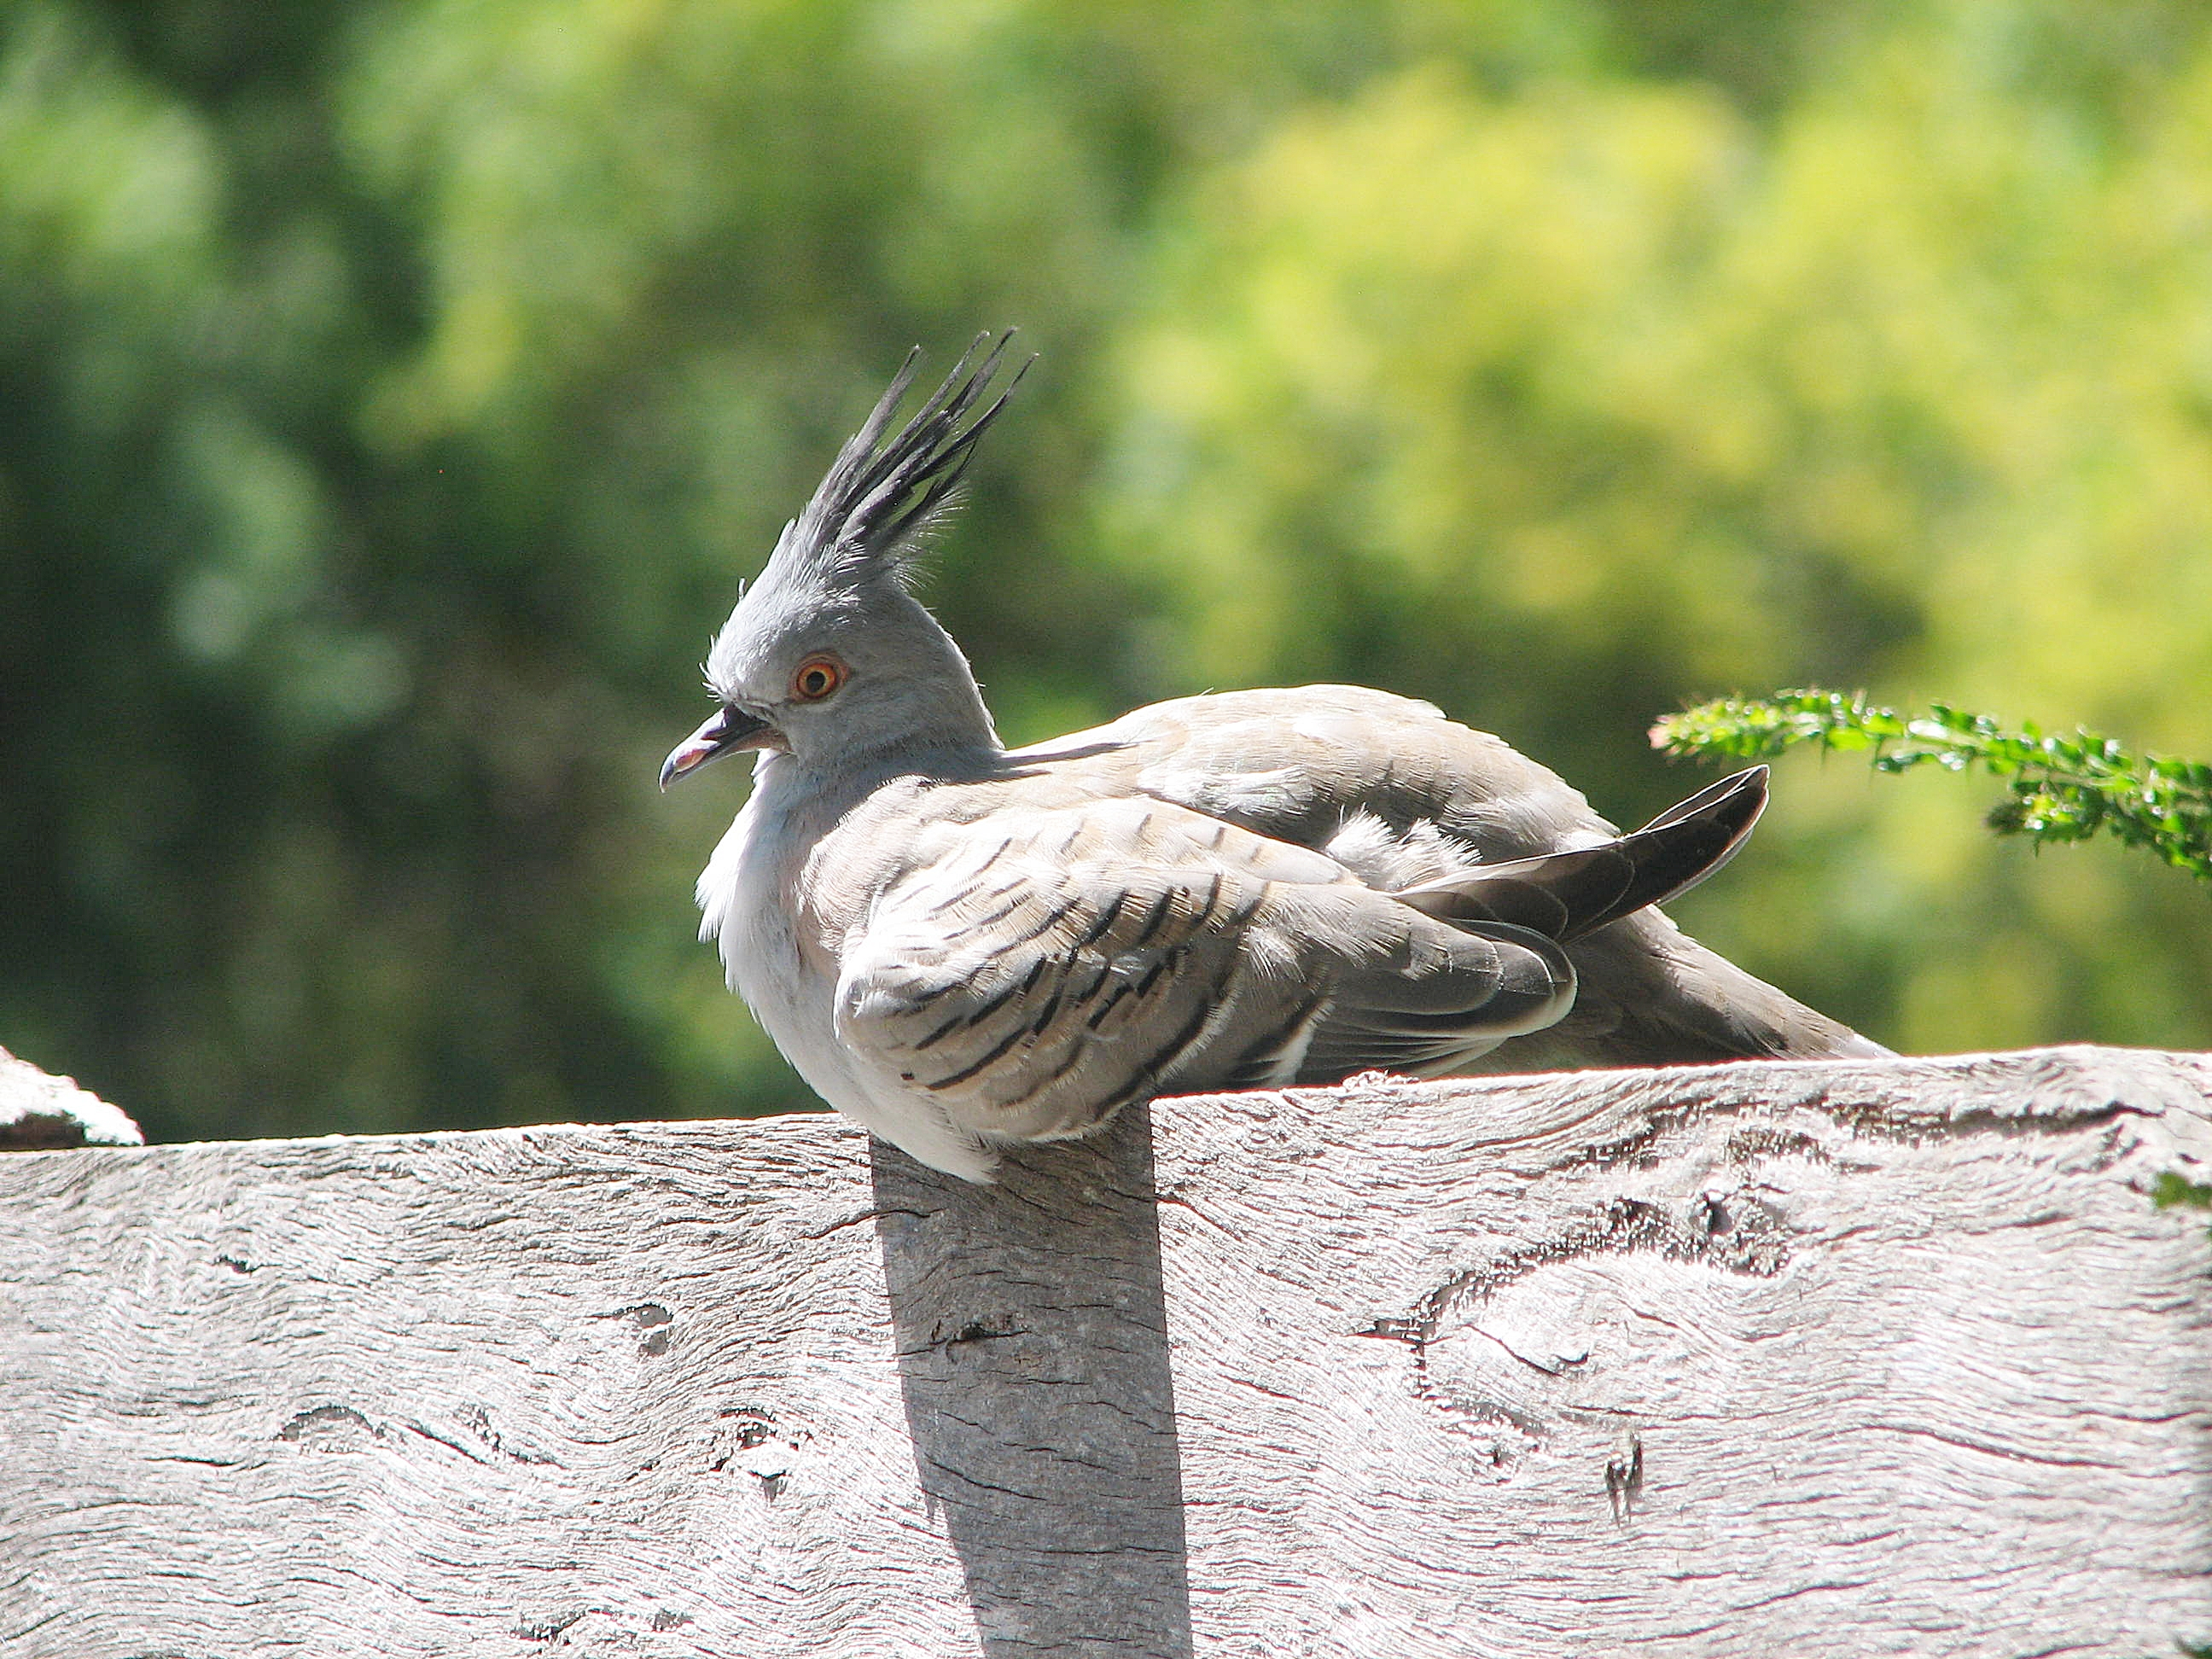 Crested Pigeons as pet birds - Trevor's Birding